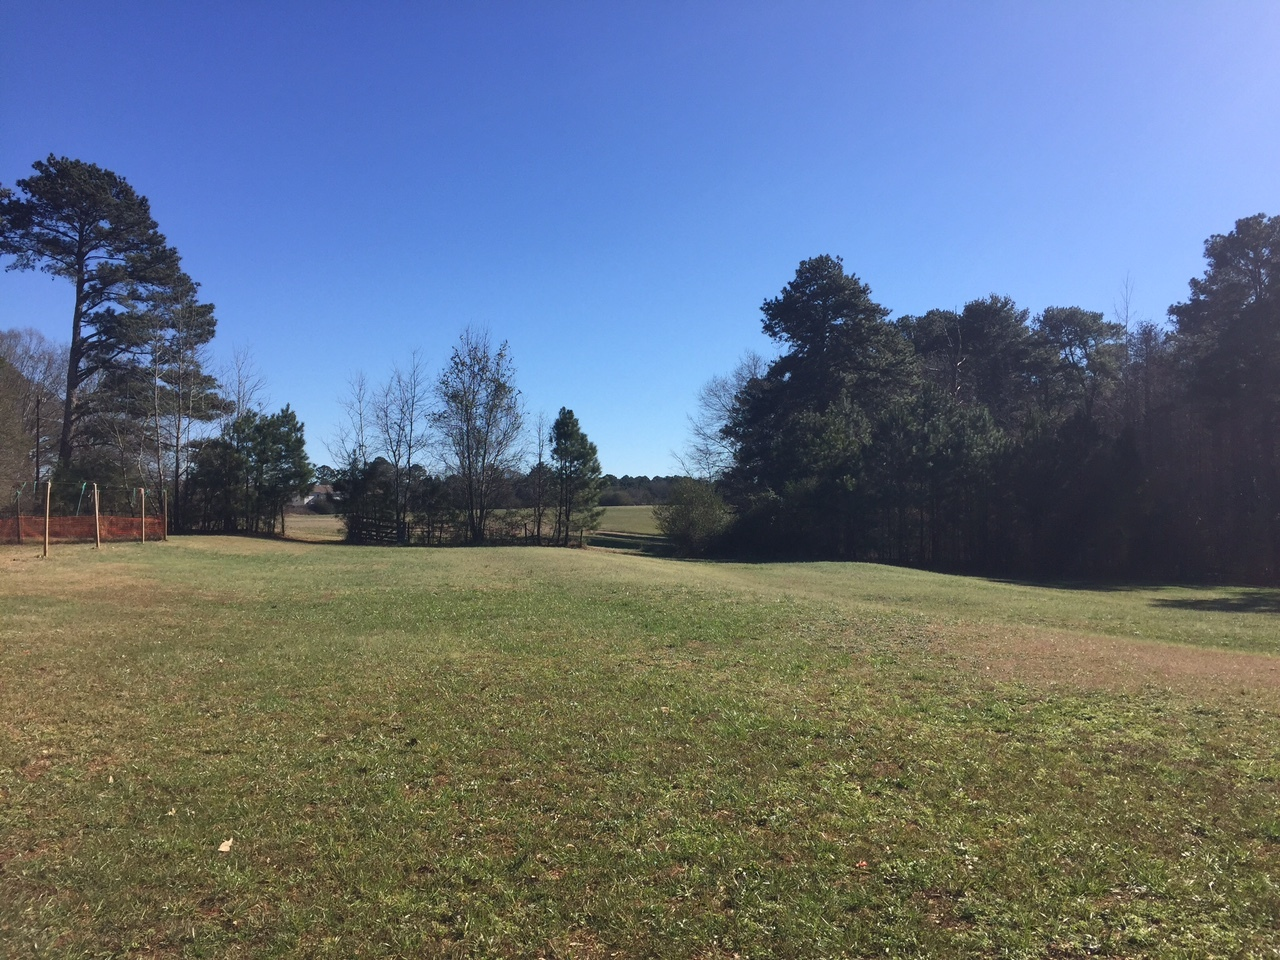 Gentlemen's Farm or Redevelopment - 2660 Old Salem Road, Conyers, GA  30013